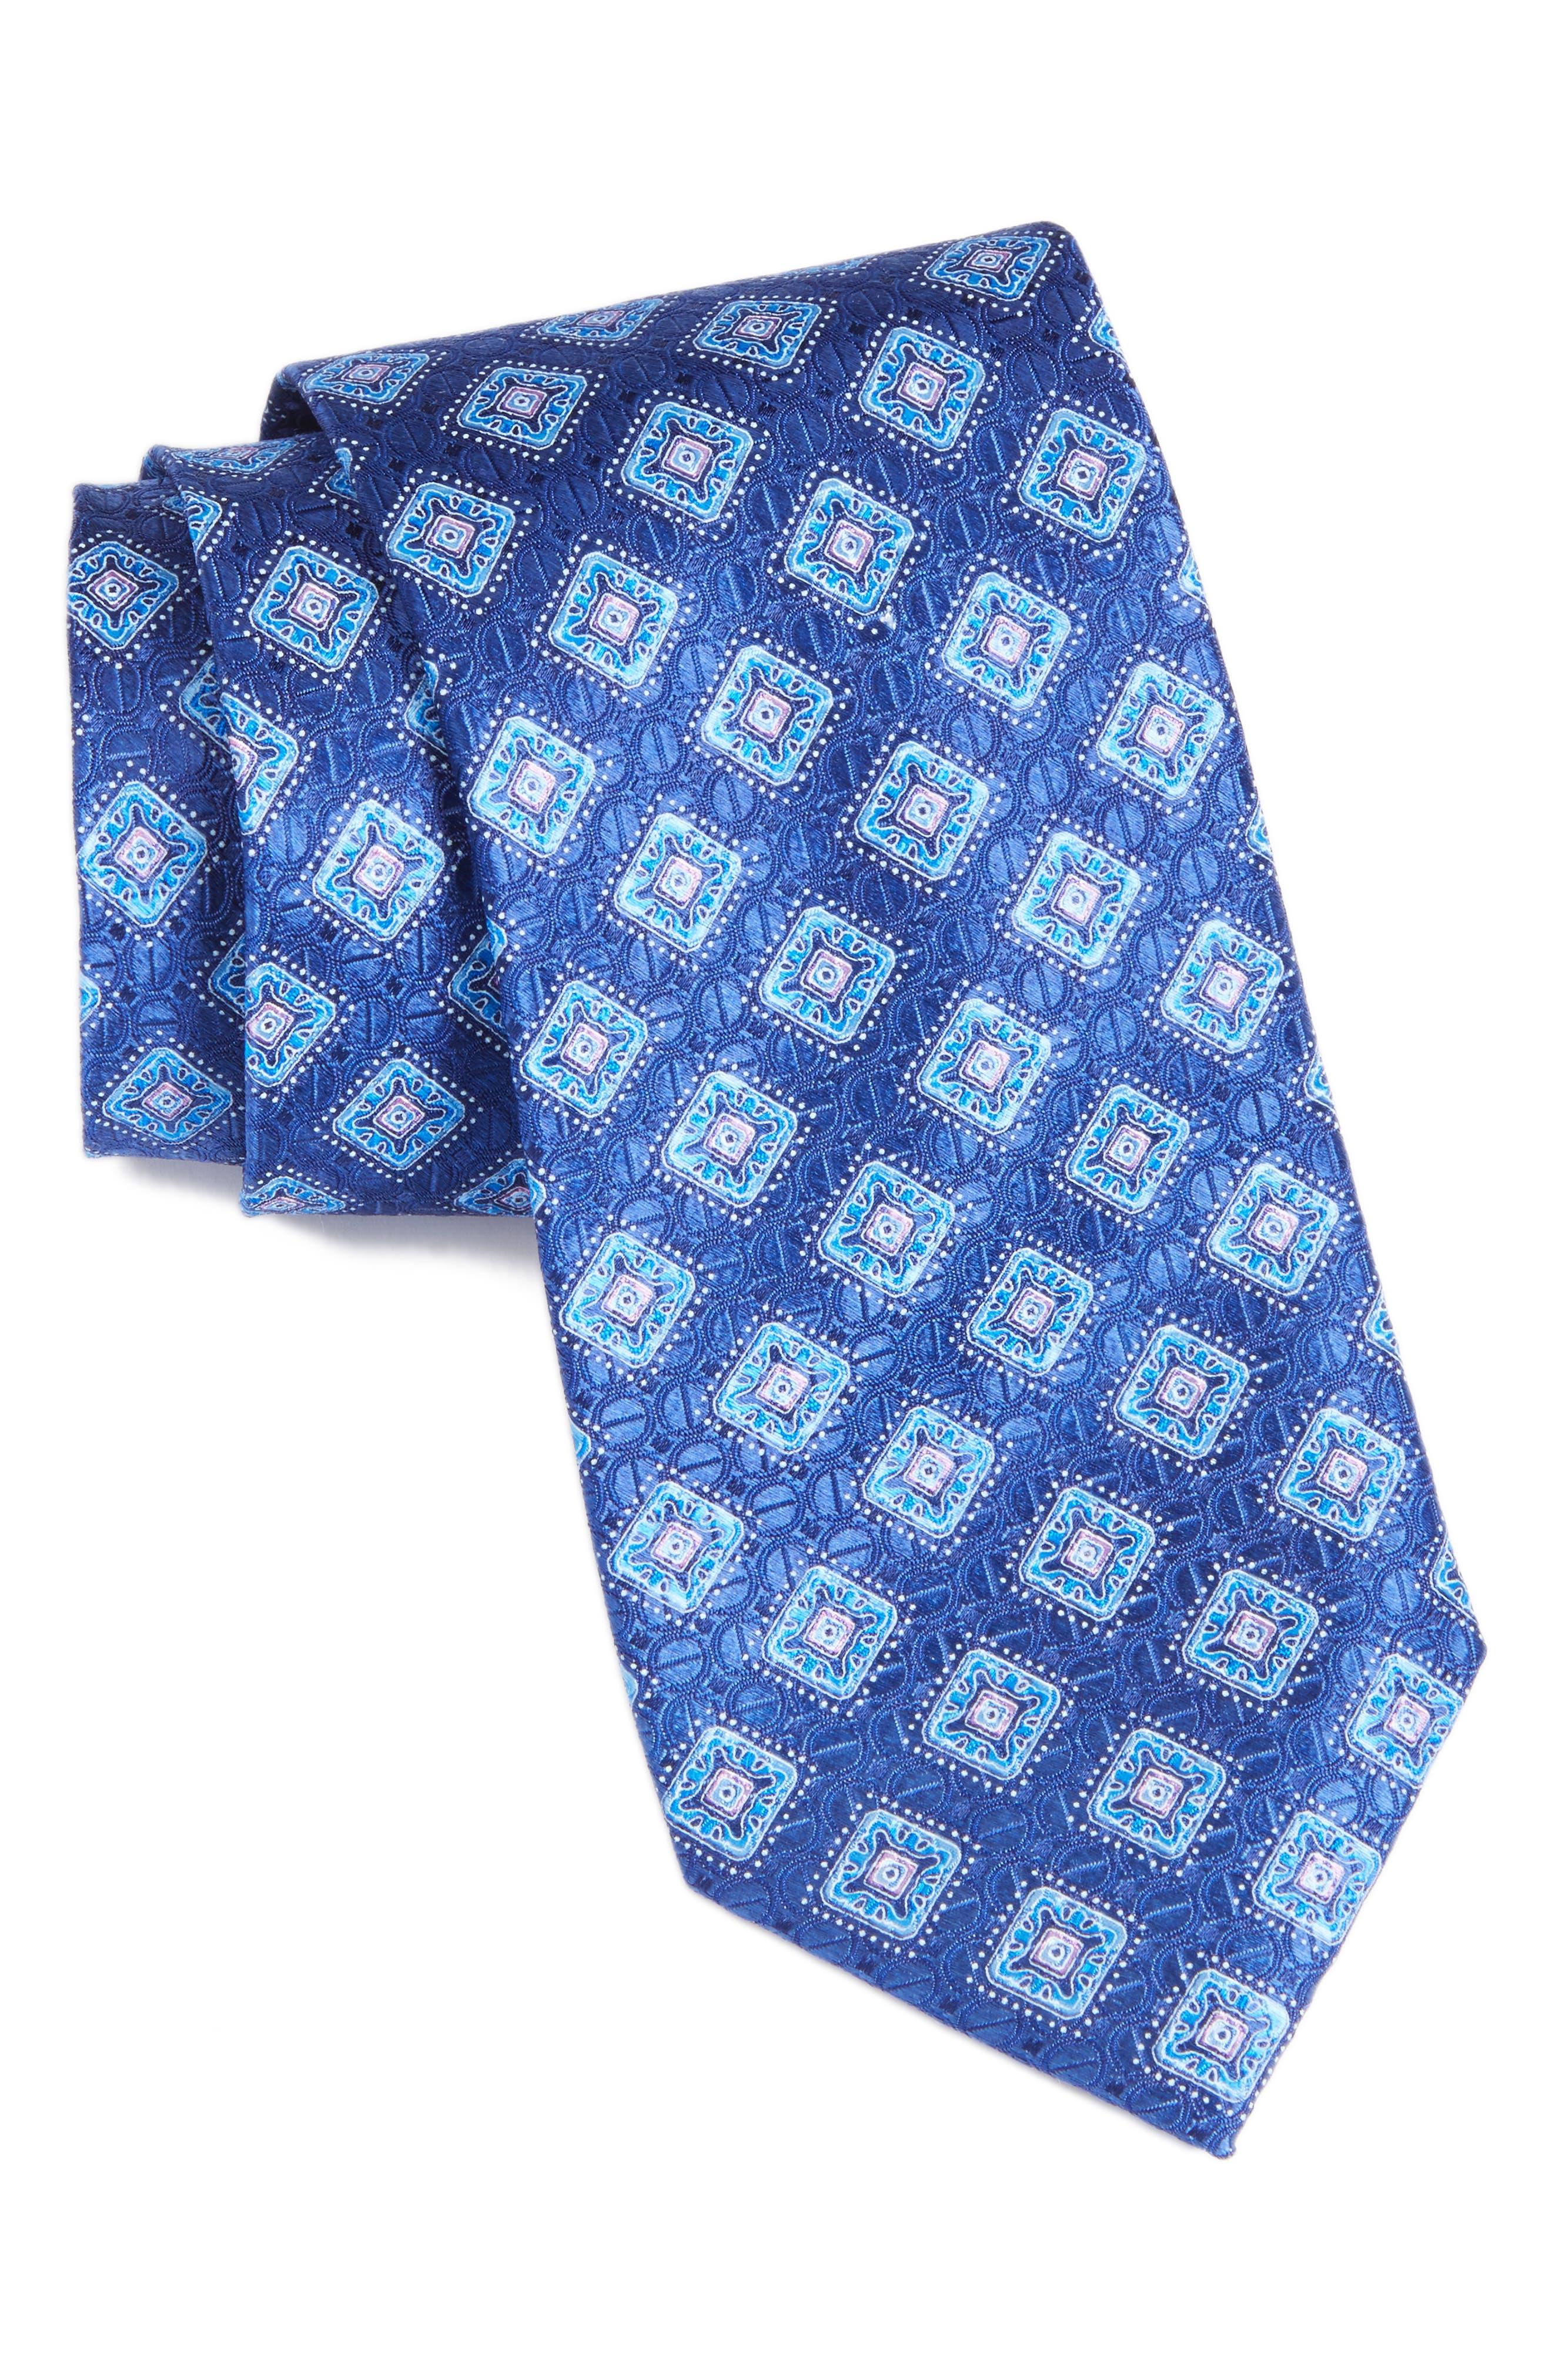 Sanders Neat Silk Tie,                         Main,                         color, Navy